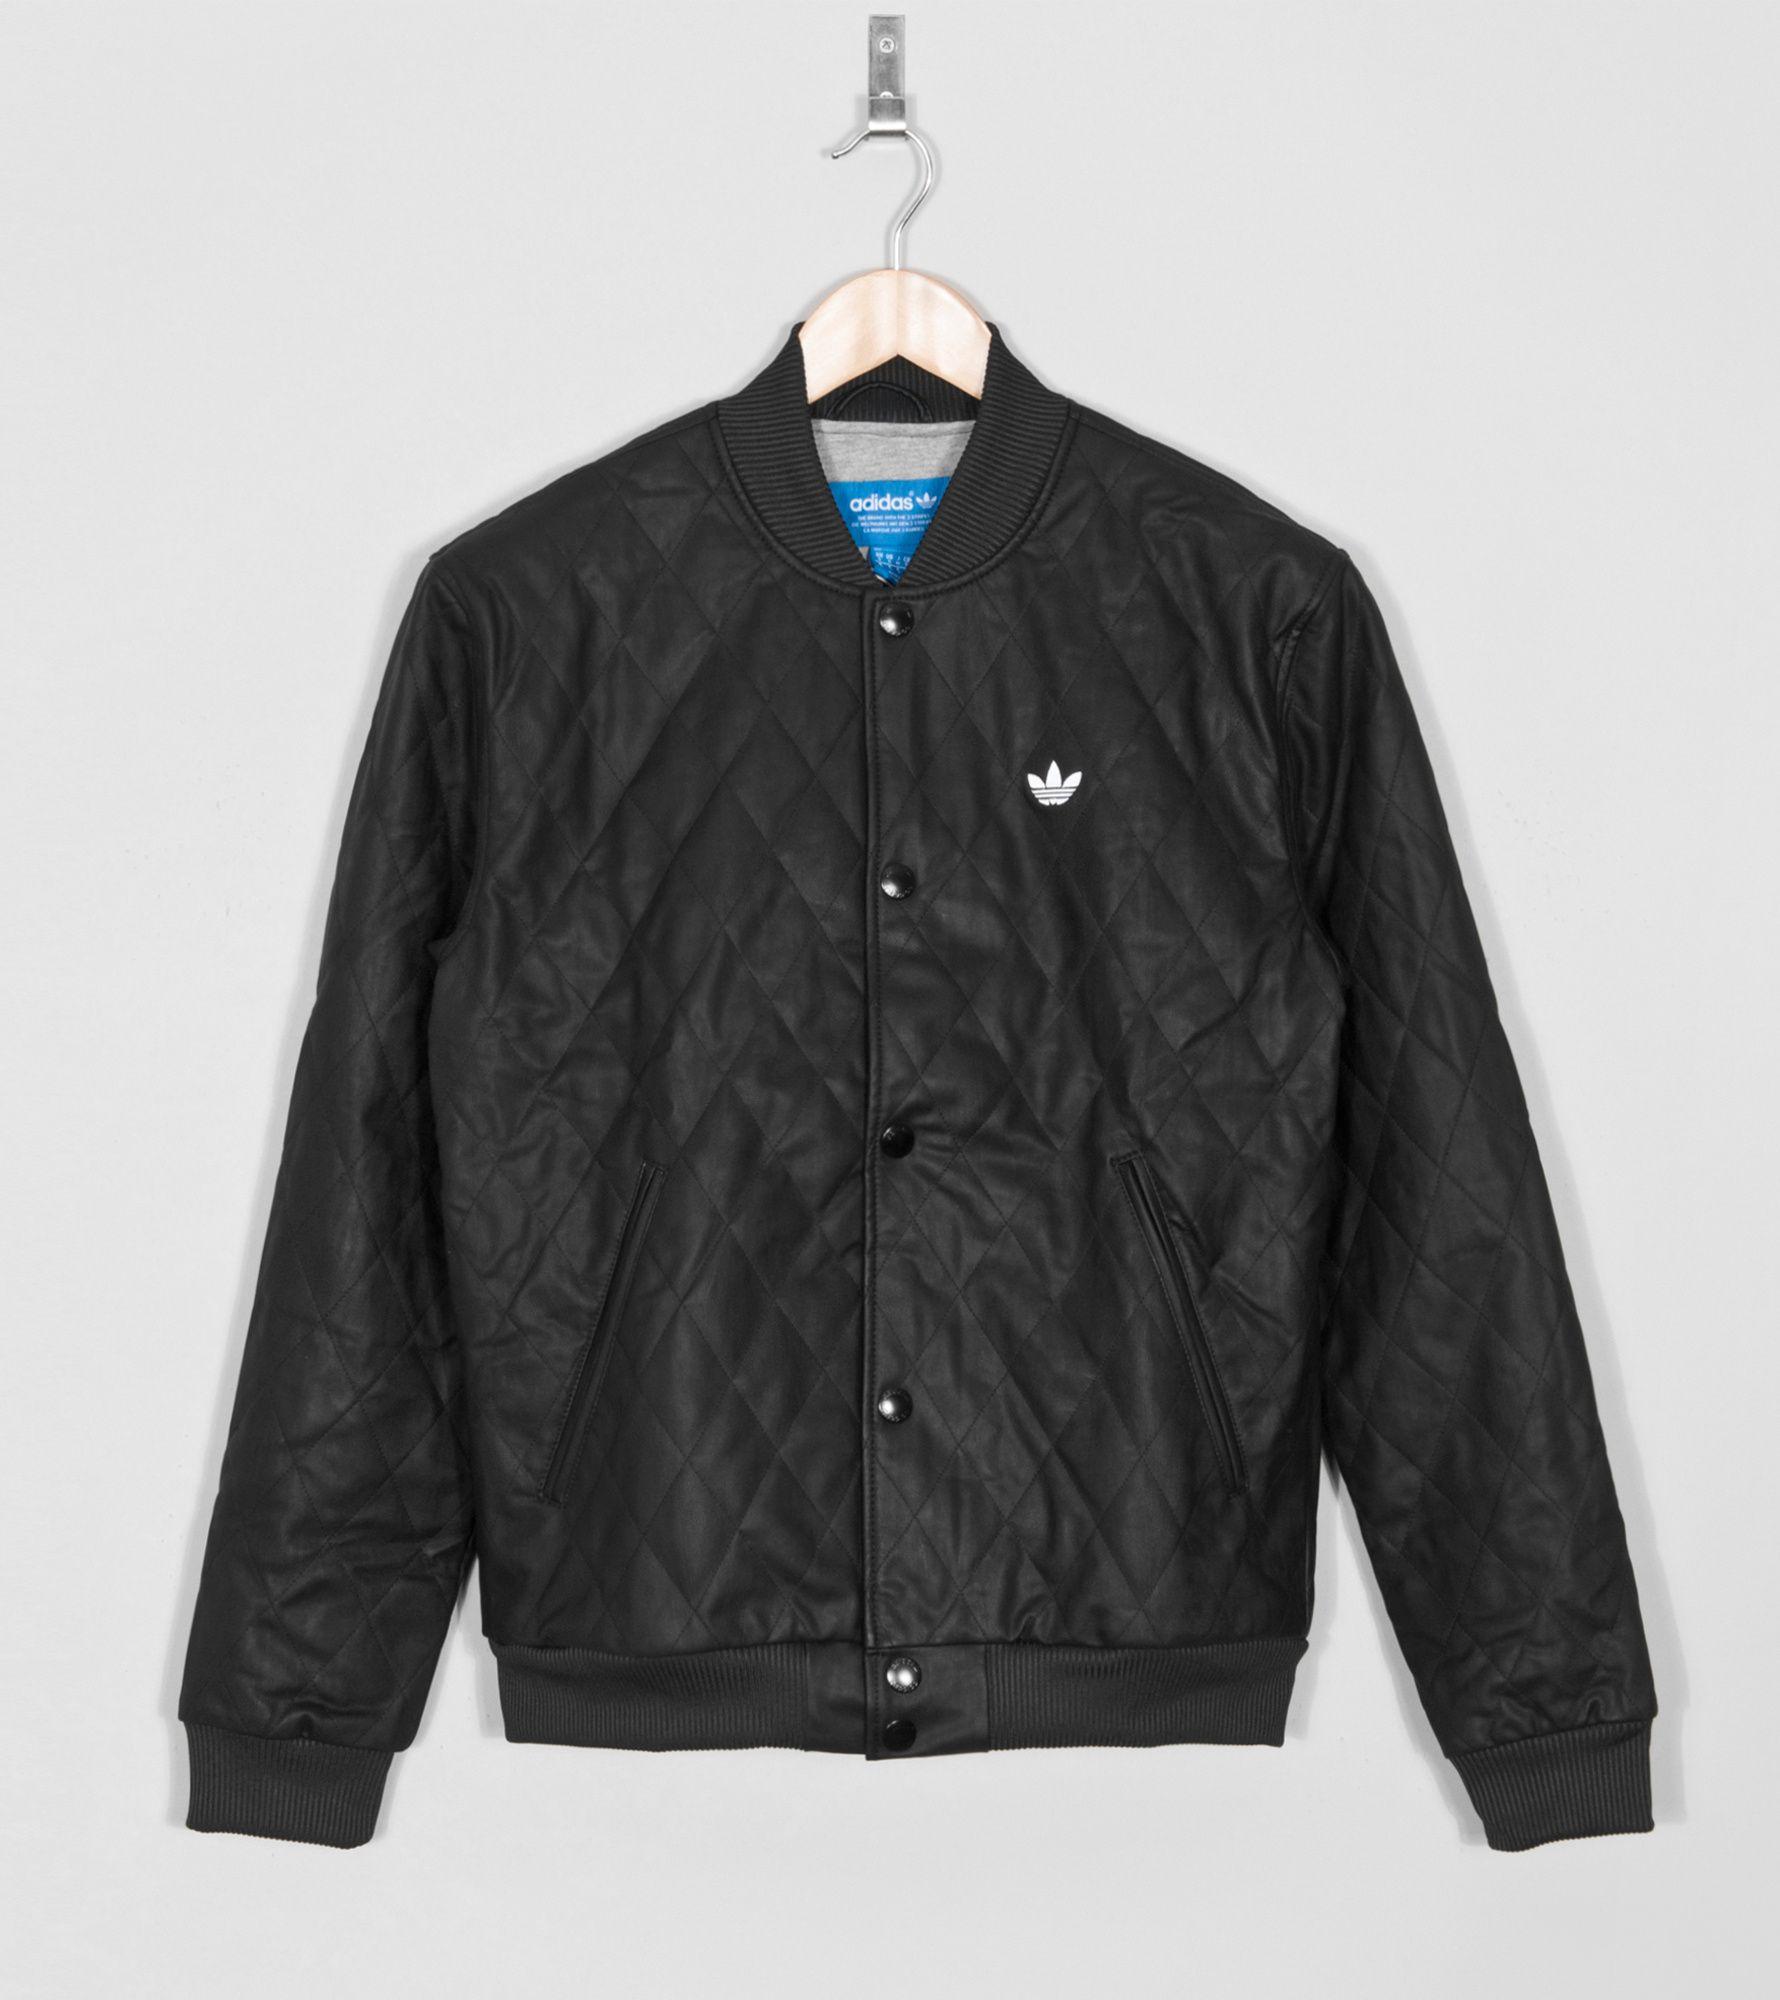 71fce895a adidas Originals Superstar Bomber Jacket | Size?